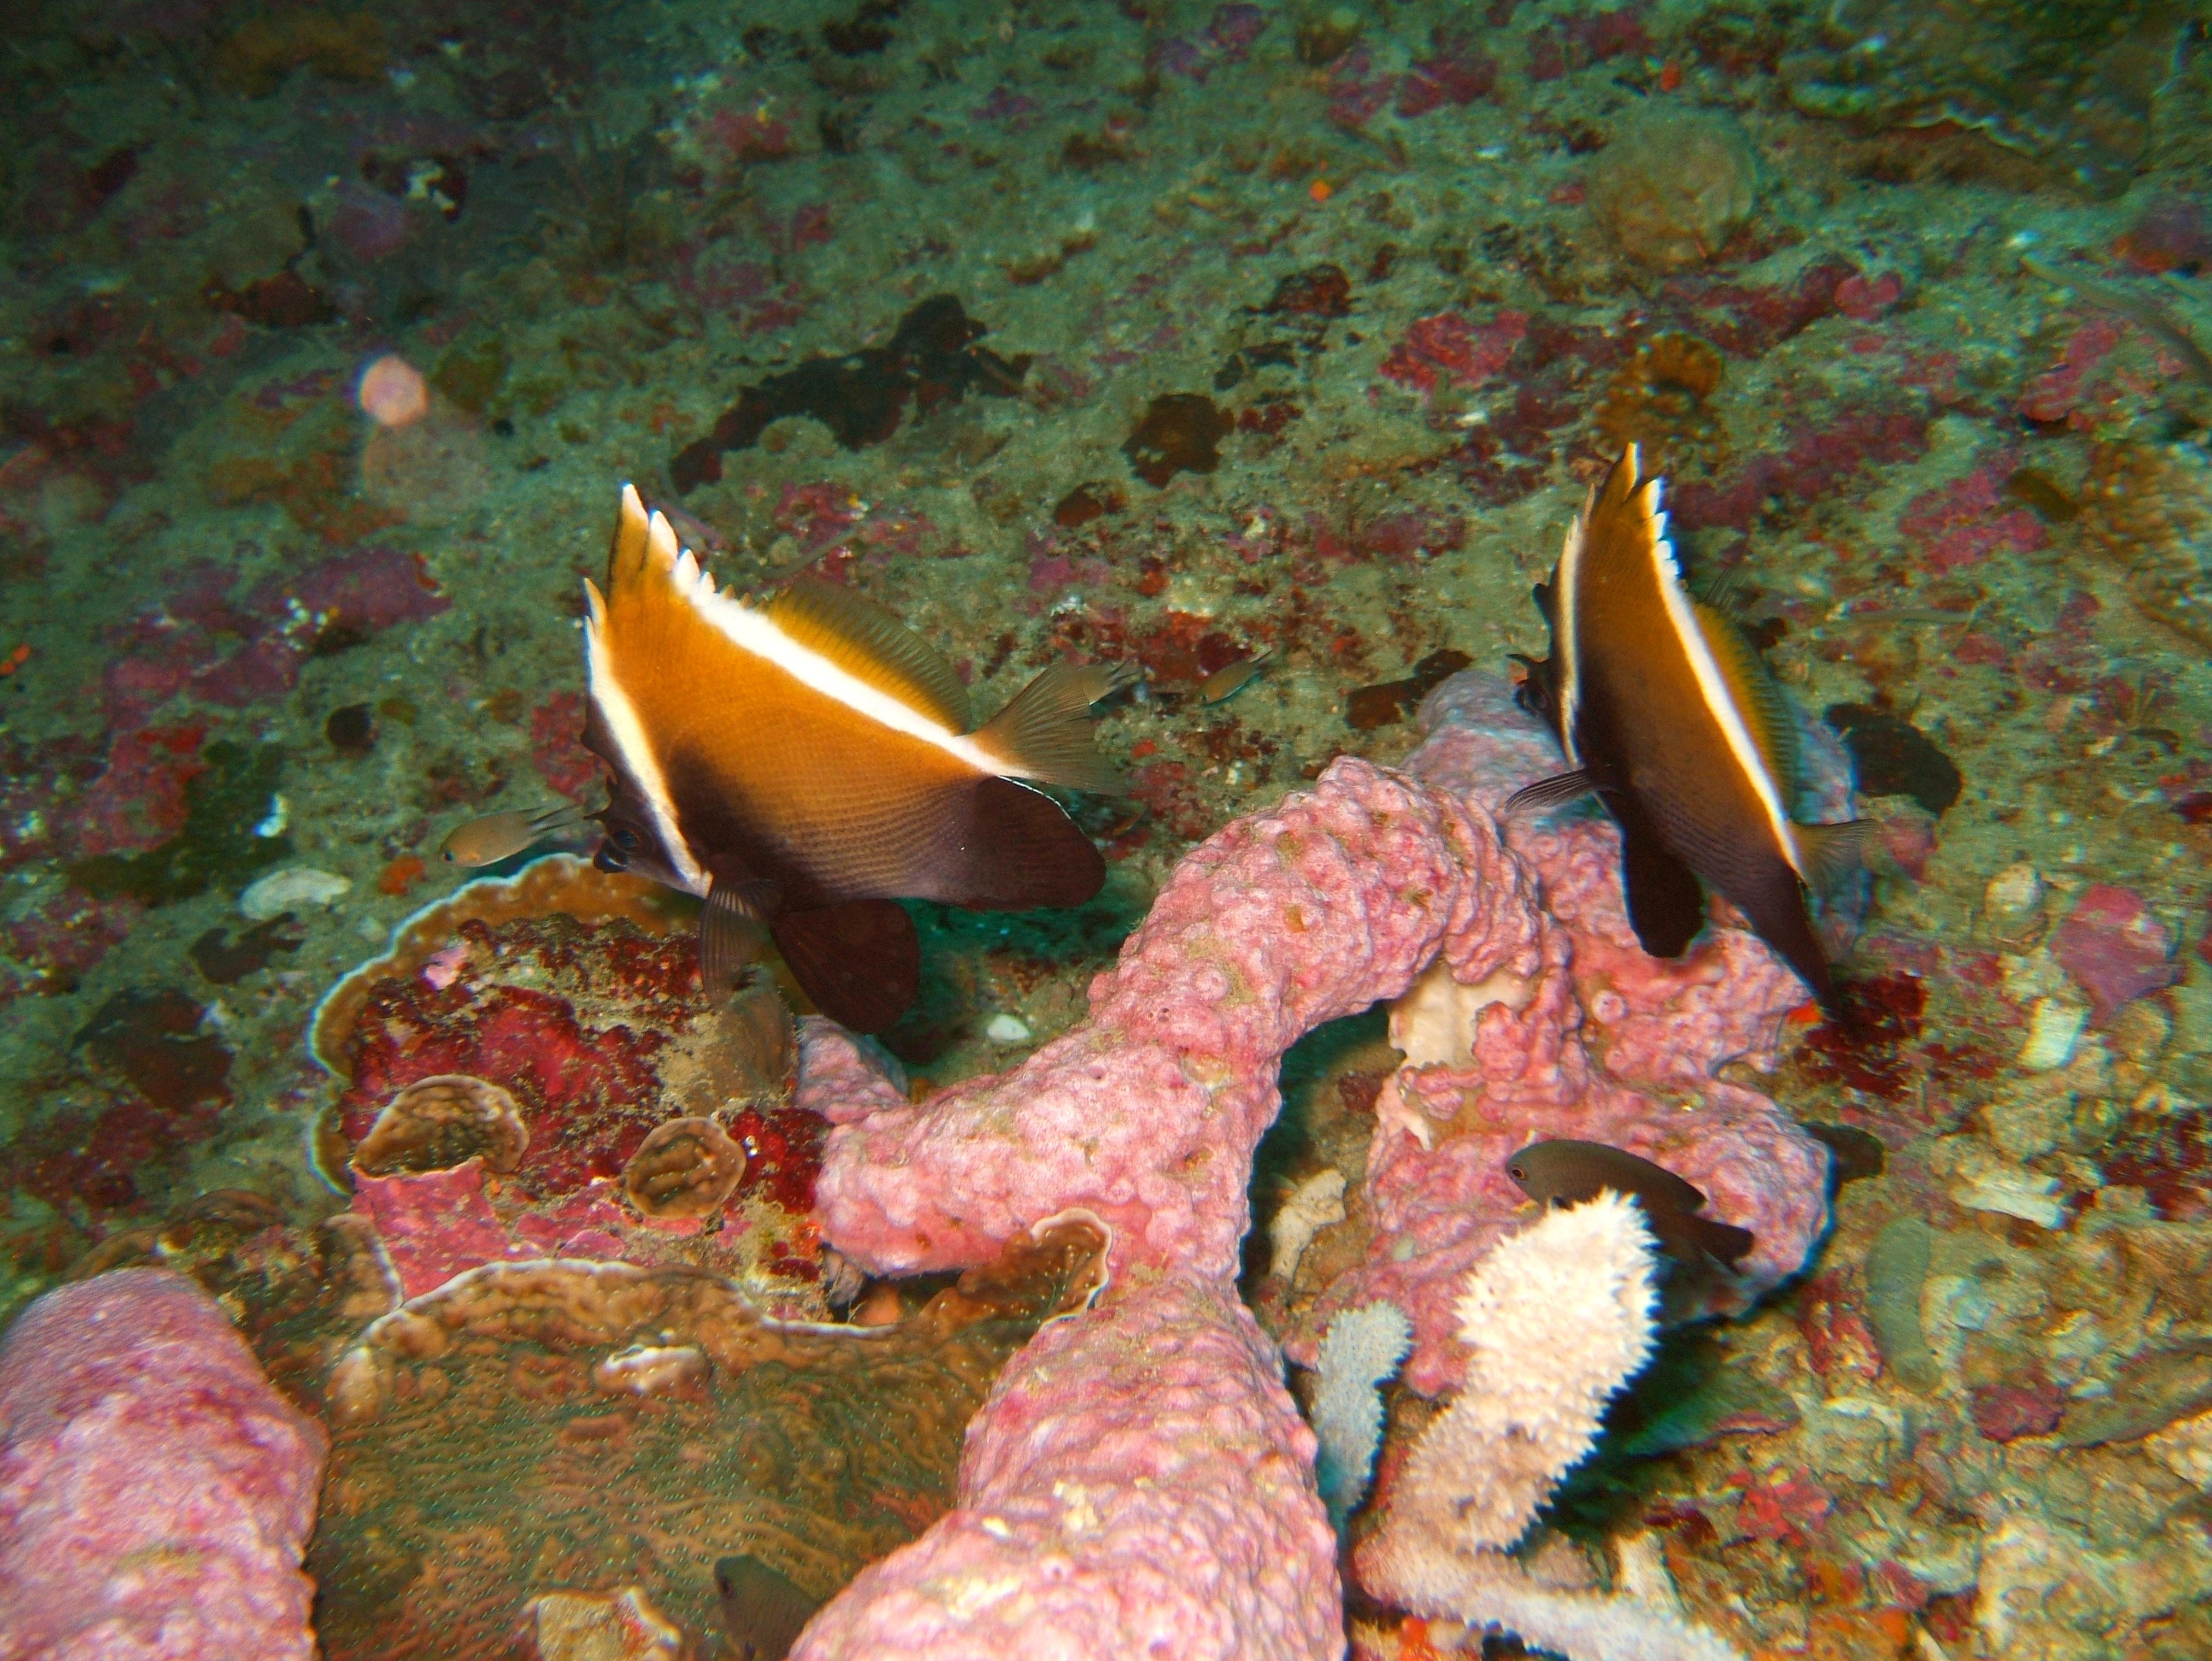 Philippines Cebu Moal Boal 20051227 Dive 1 Pescador Island 50